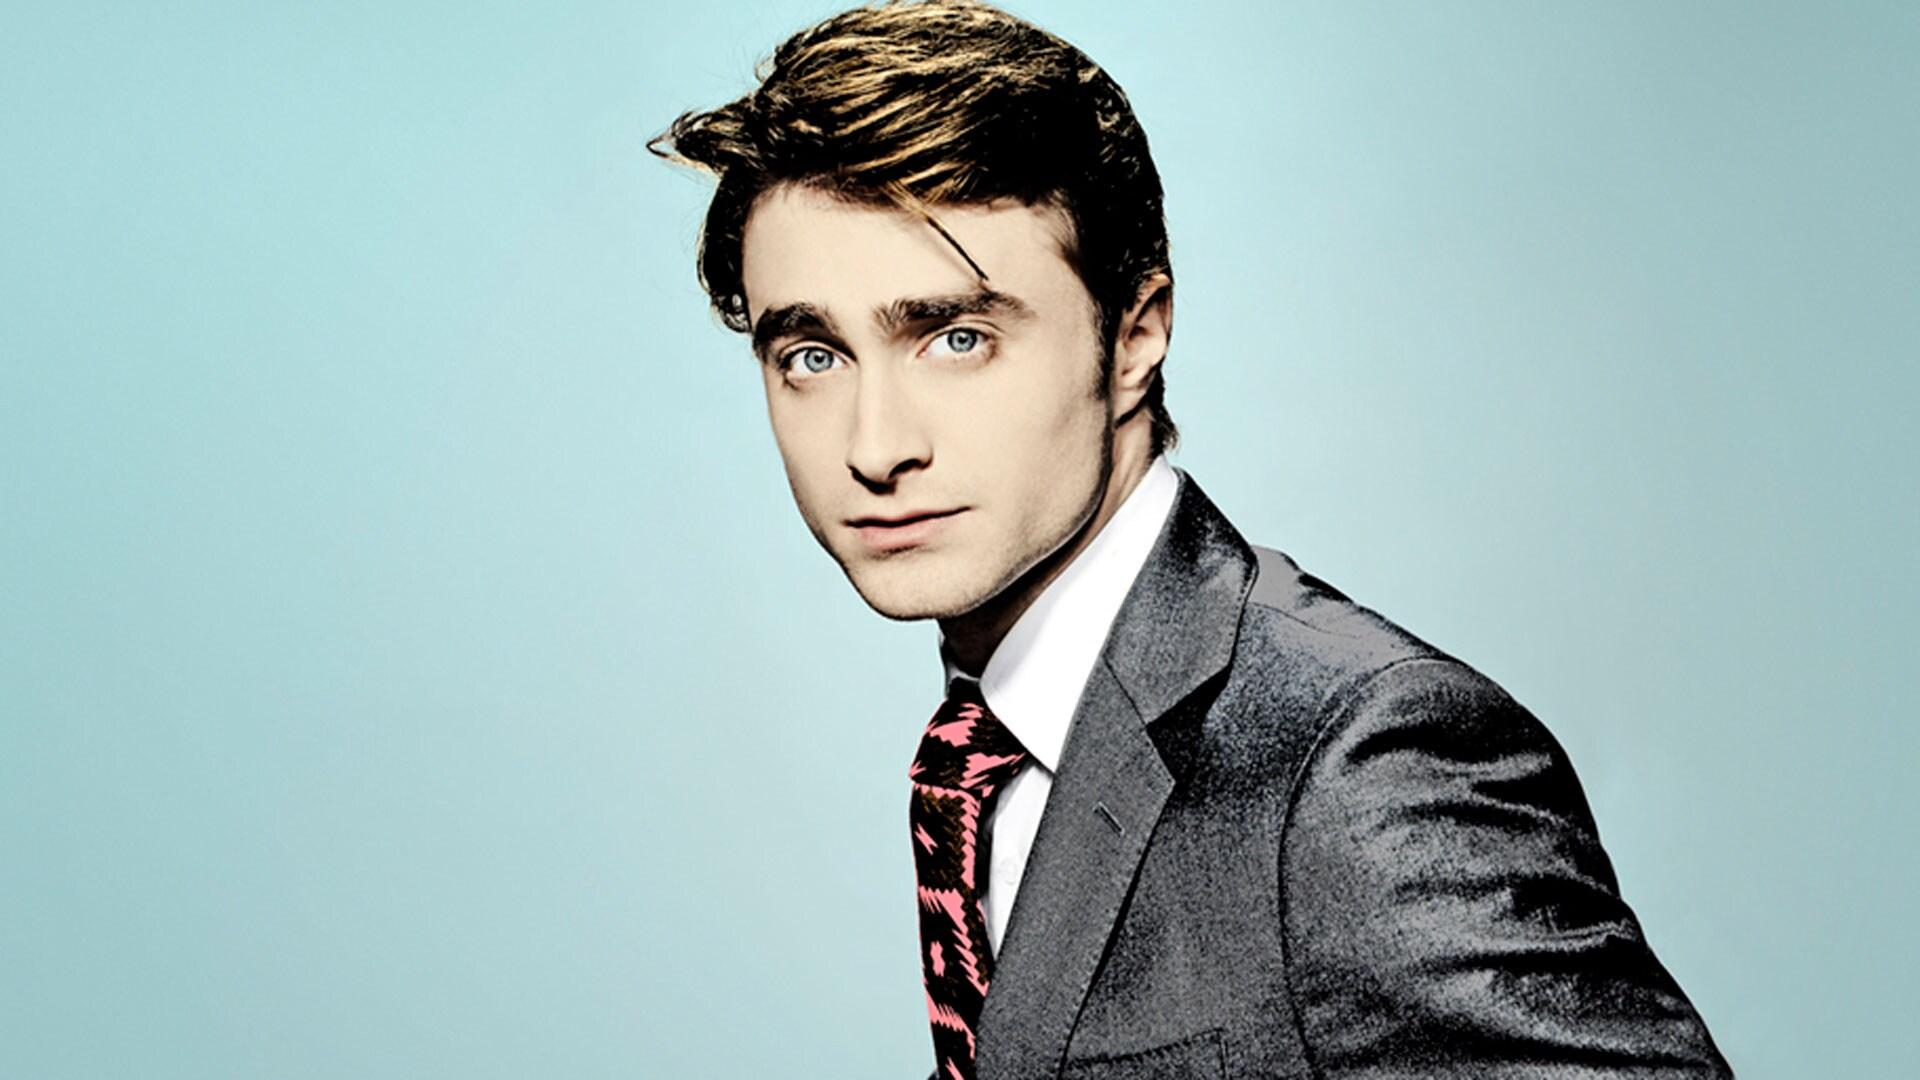 Daniel Radcliffe: January 14, 2012